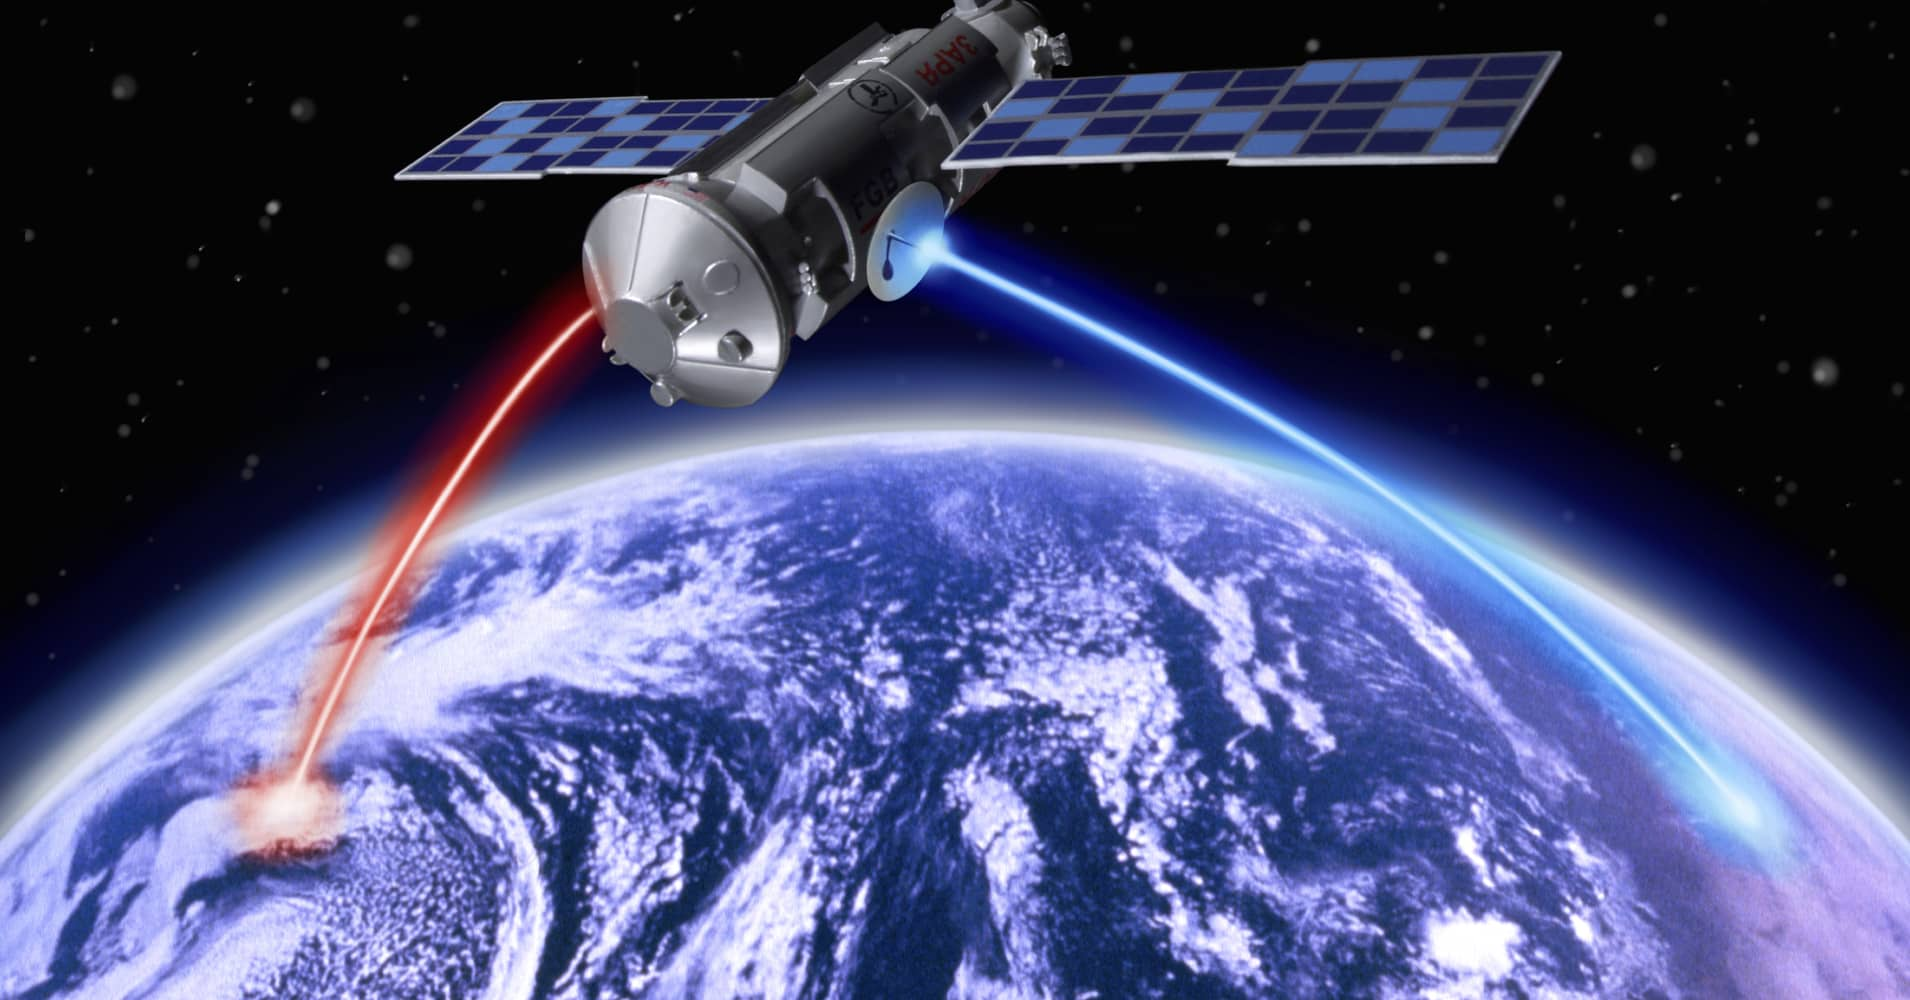 Satellite start-up raises $100 million to put cloud data storage in space